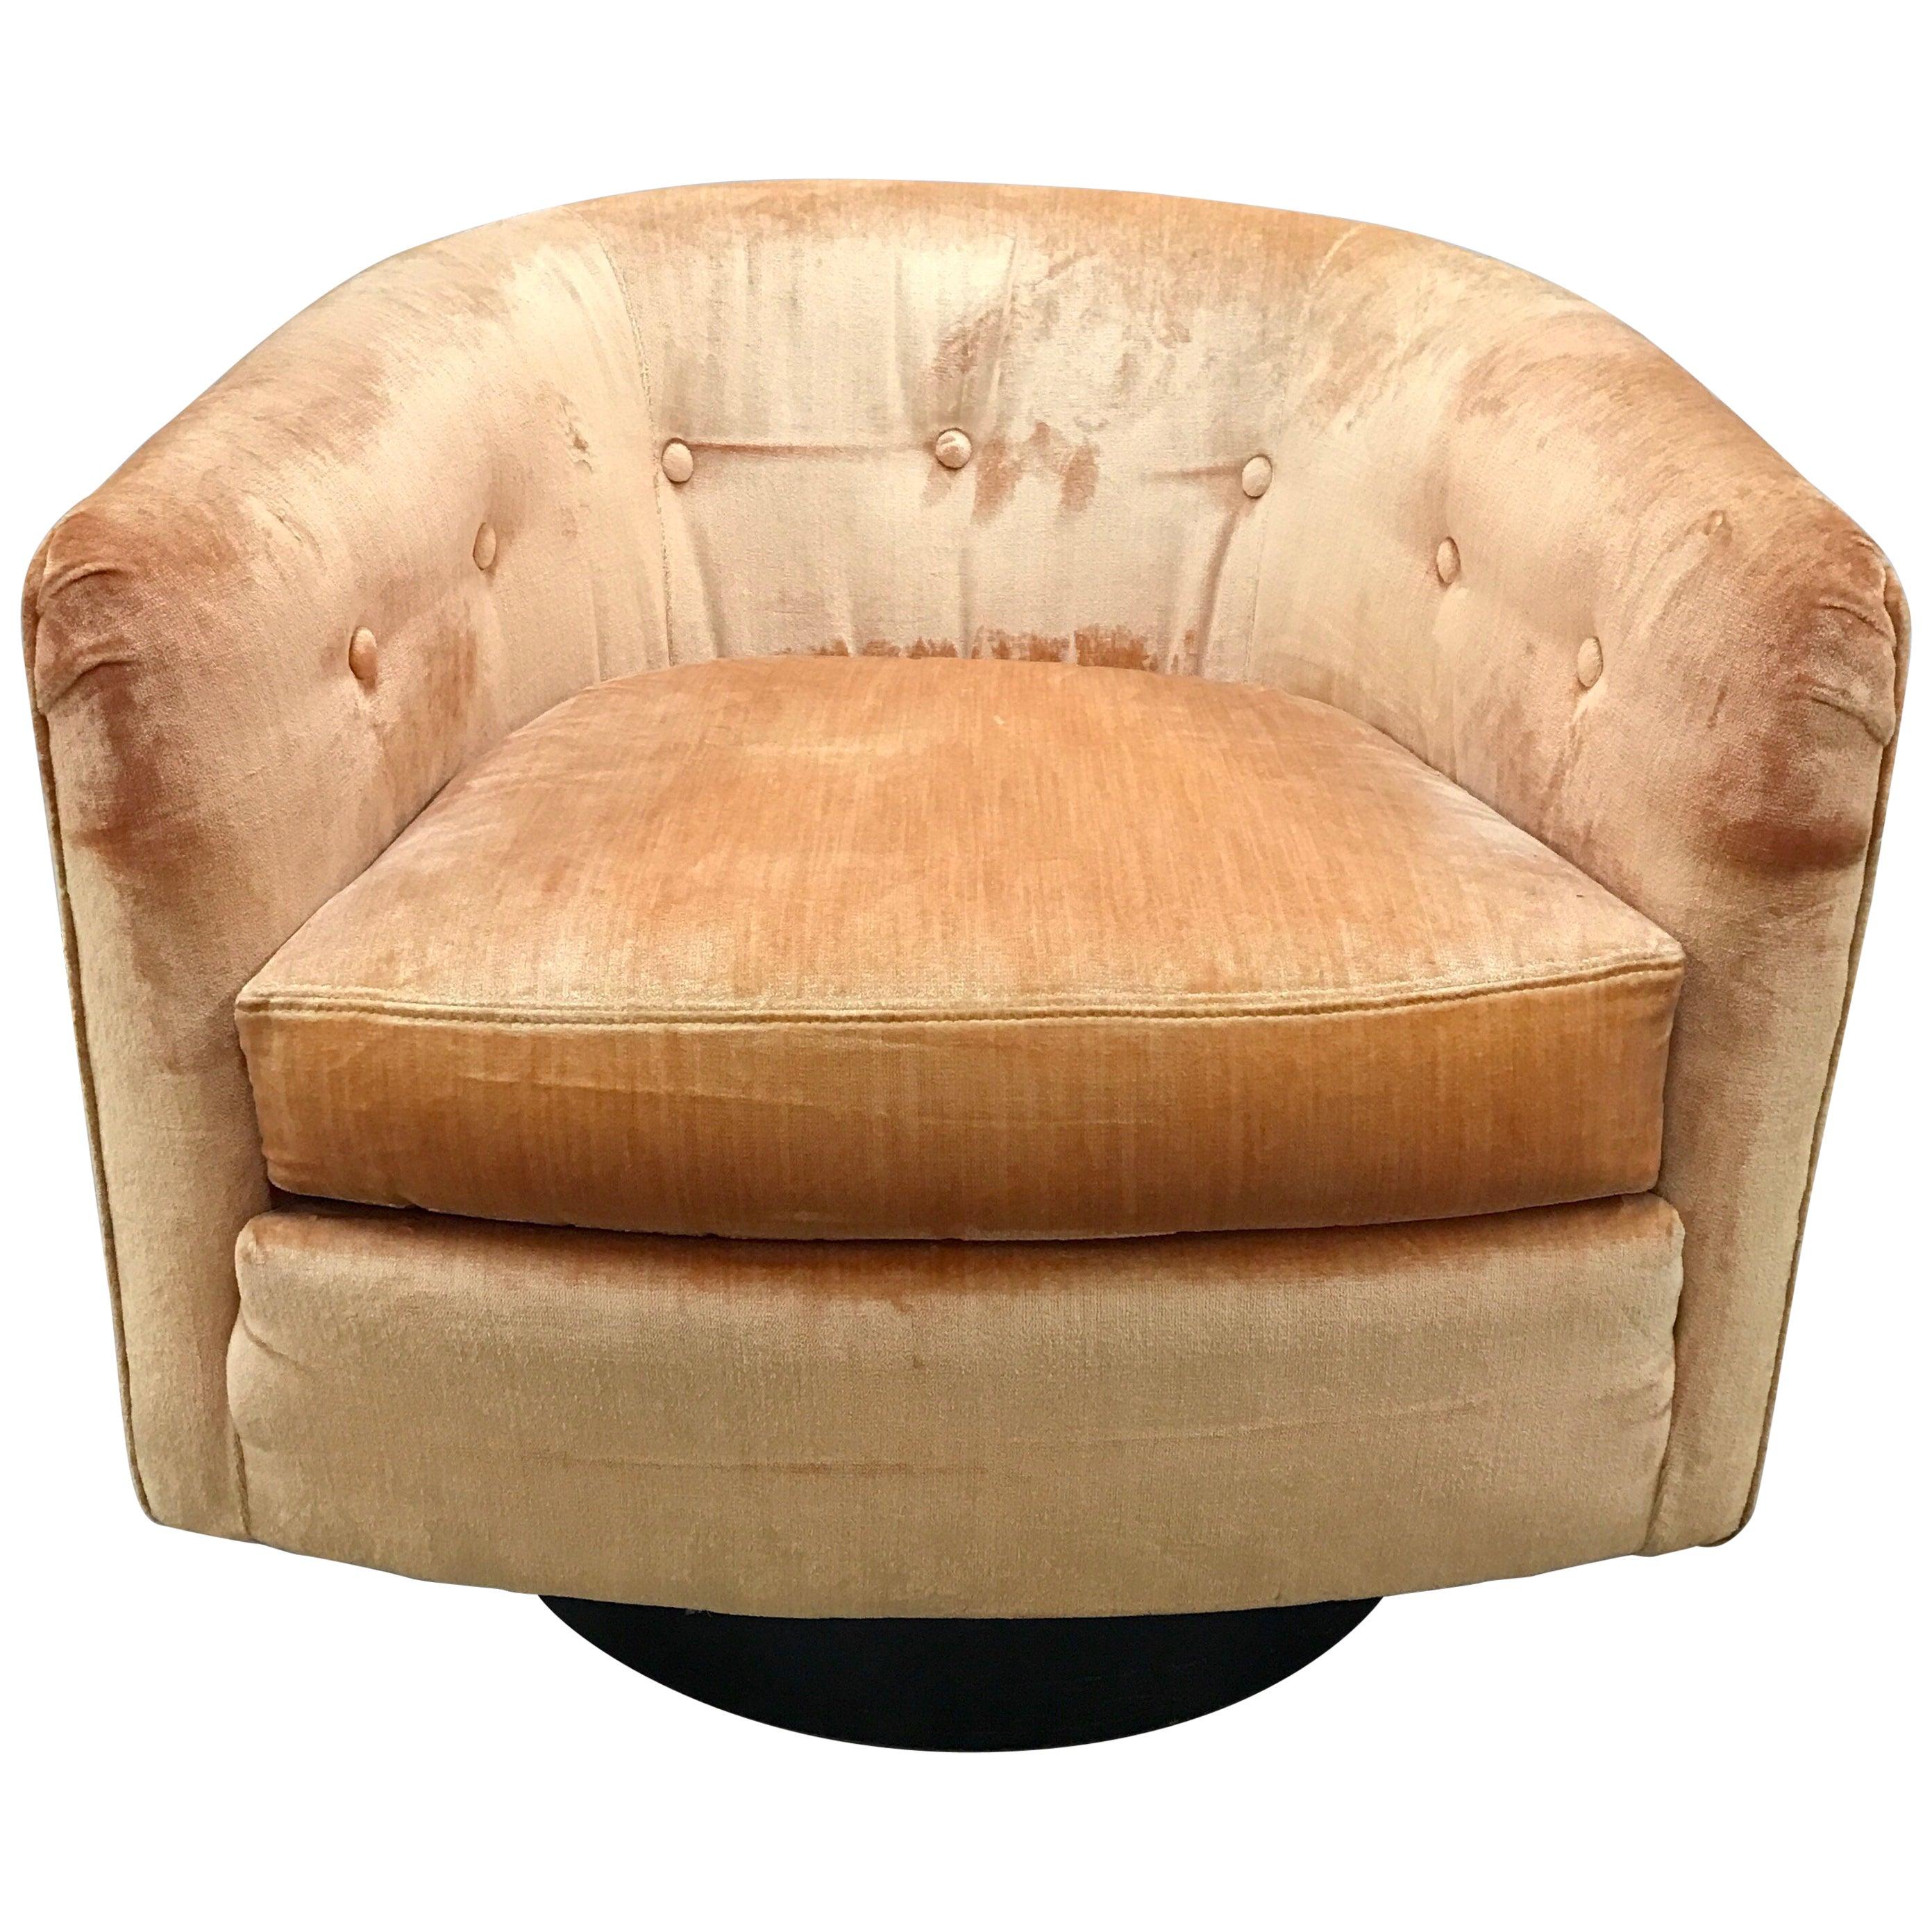 Set of Three Matching Midcentury Milo Baughman Style Swivel Barrel Back Chairs